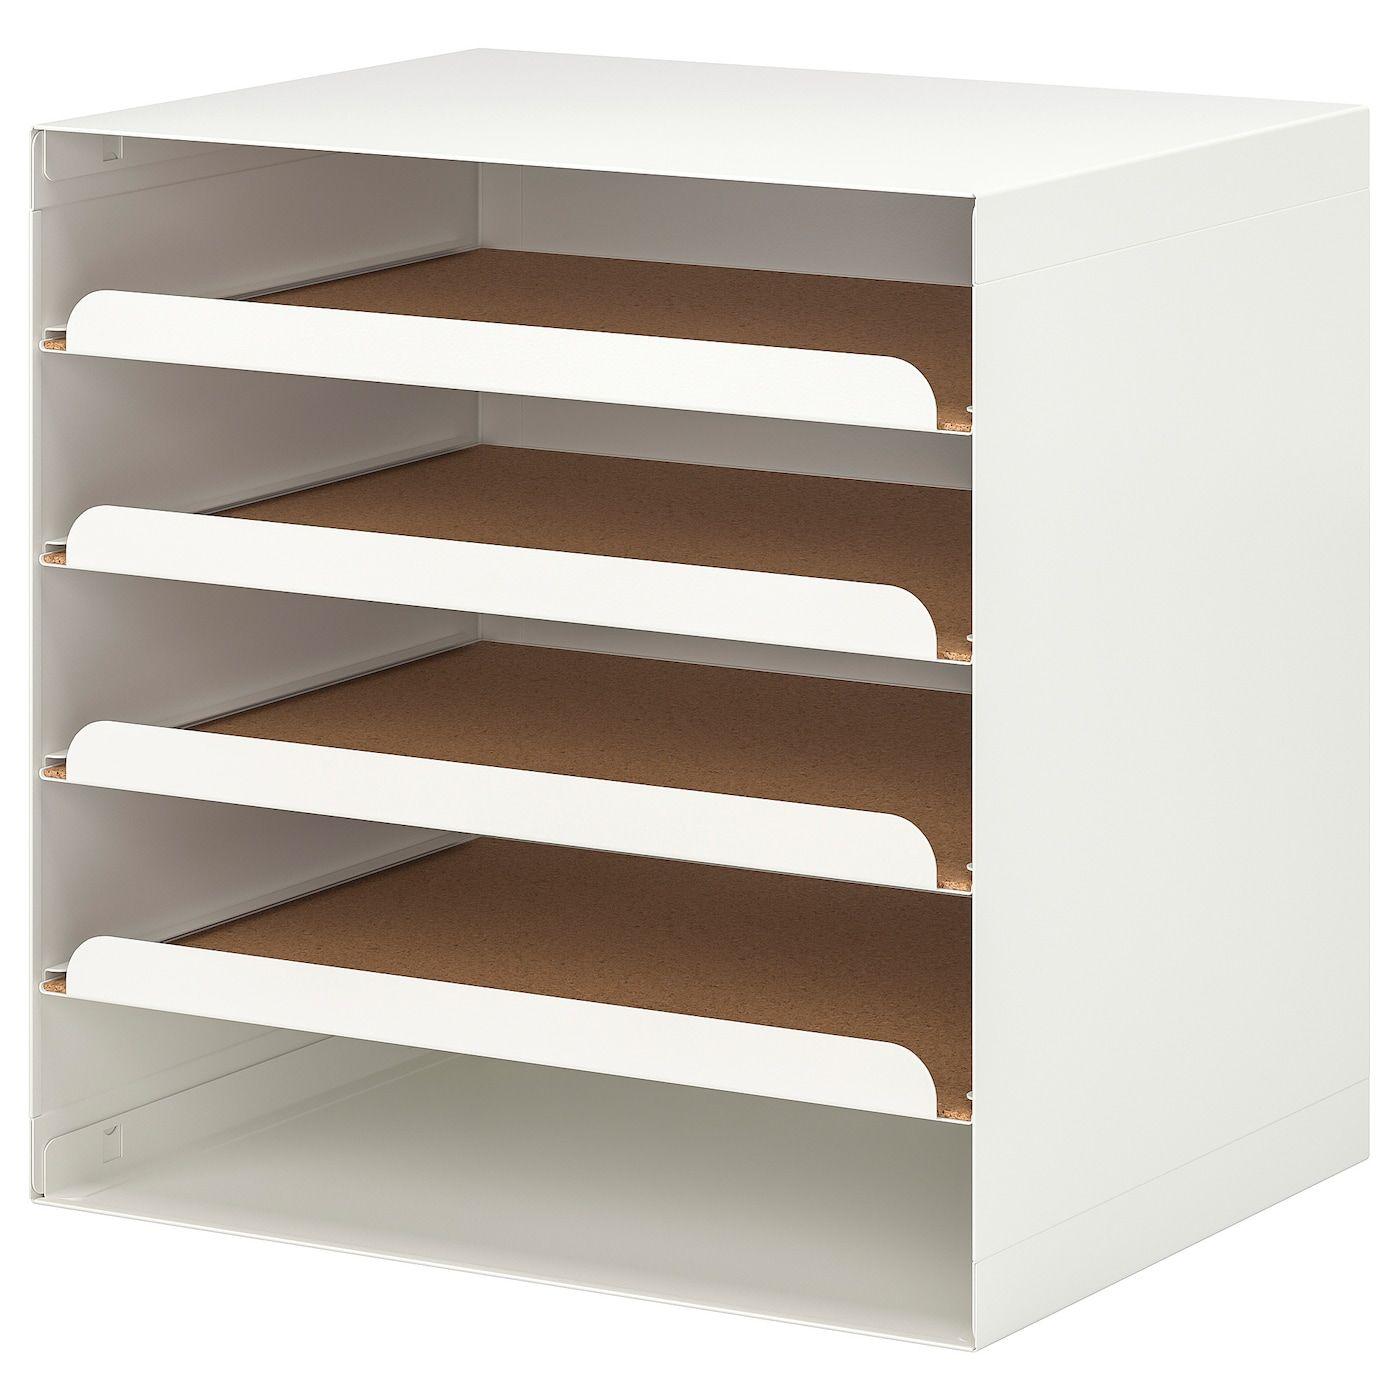 Kvissle Letter Tray White Ikea In 2020 Letter Tray Desk Paper Organizer Ikea